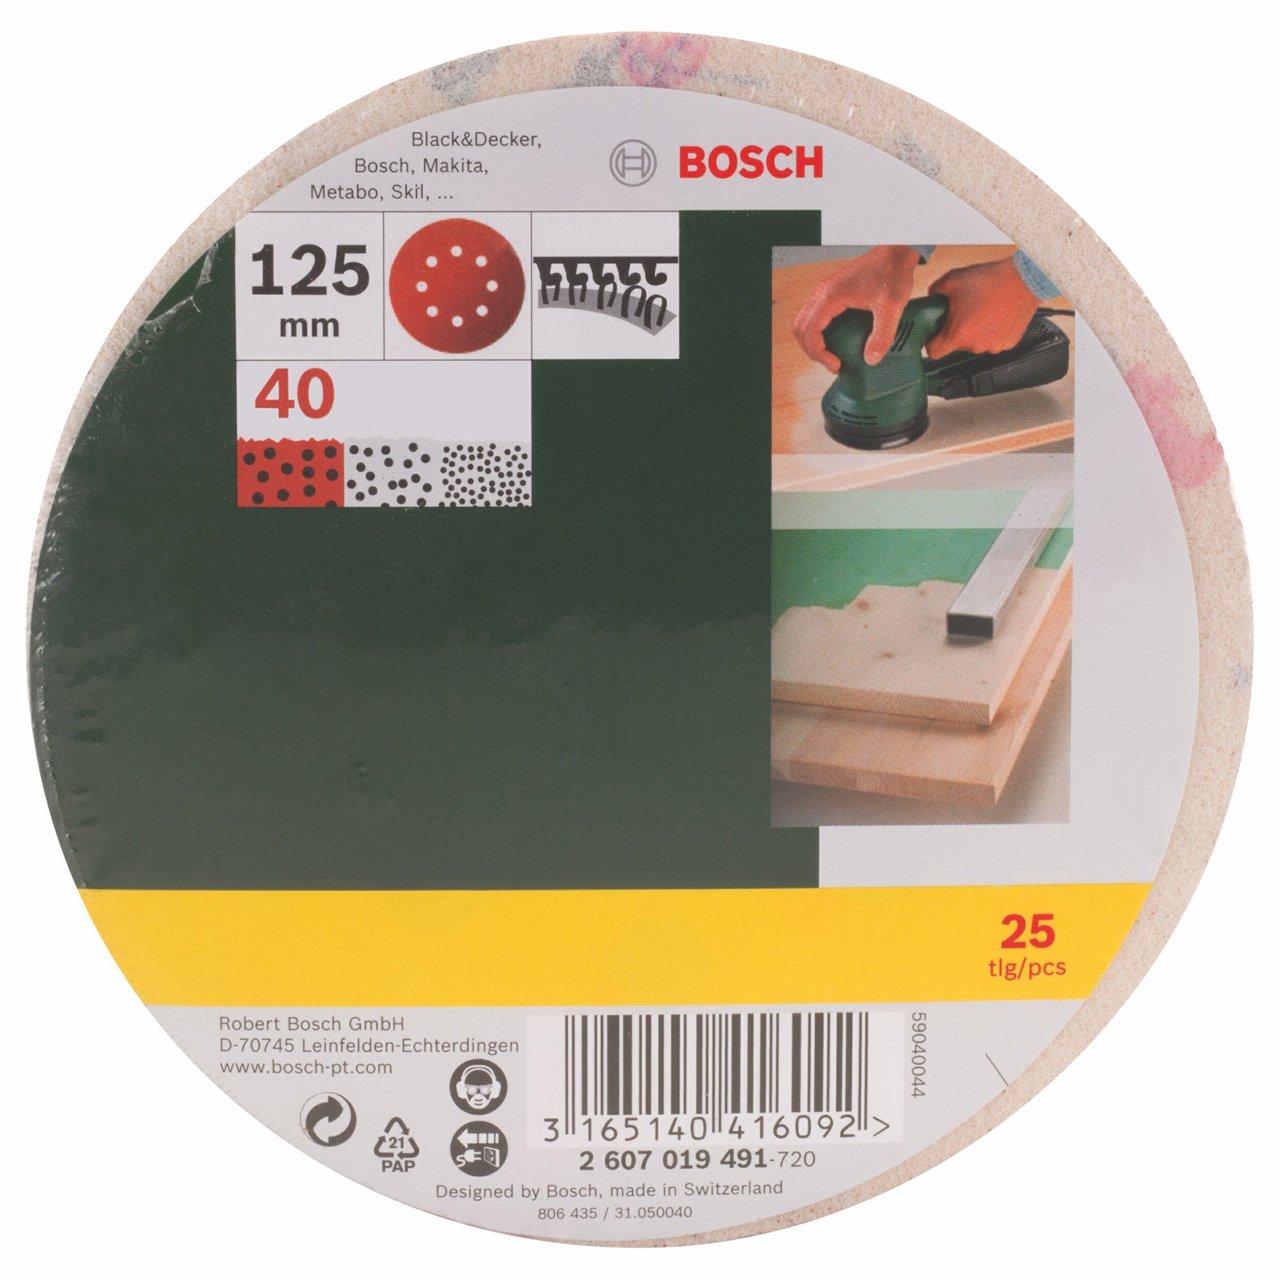 Bosch DIY Schleifblatt verschiedene Materialien für Exzenterschleifer (25 Stück, Ø 125 mm, Körnung 40) Ø 125 mm Körnung 40) 2607019491